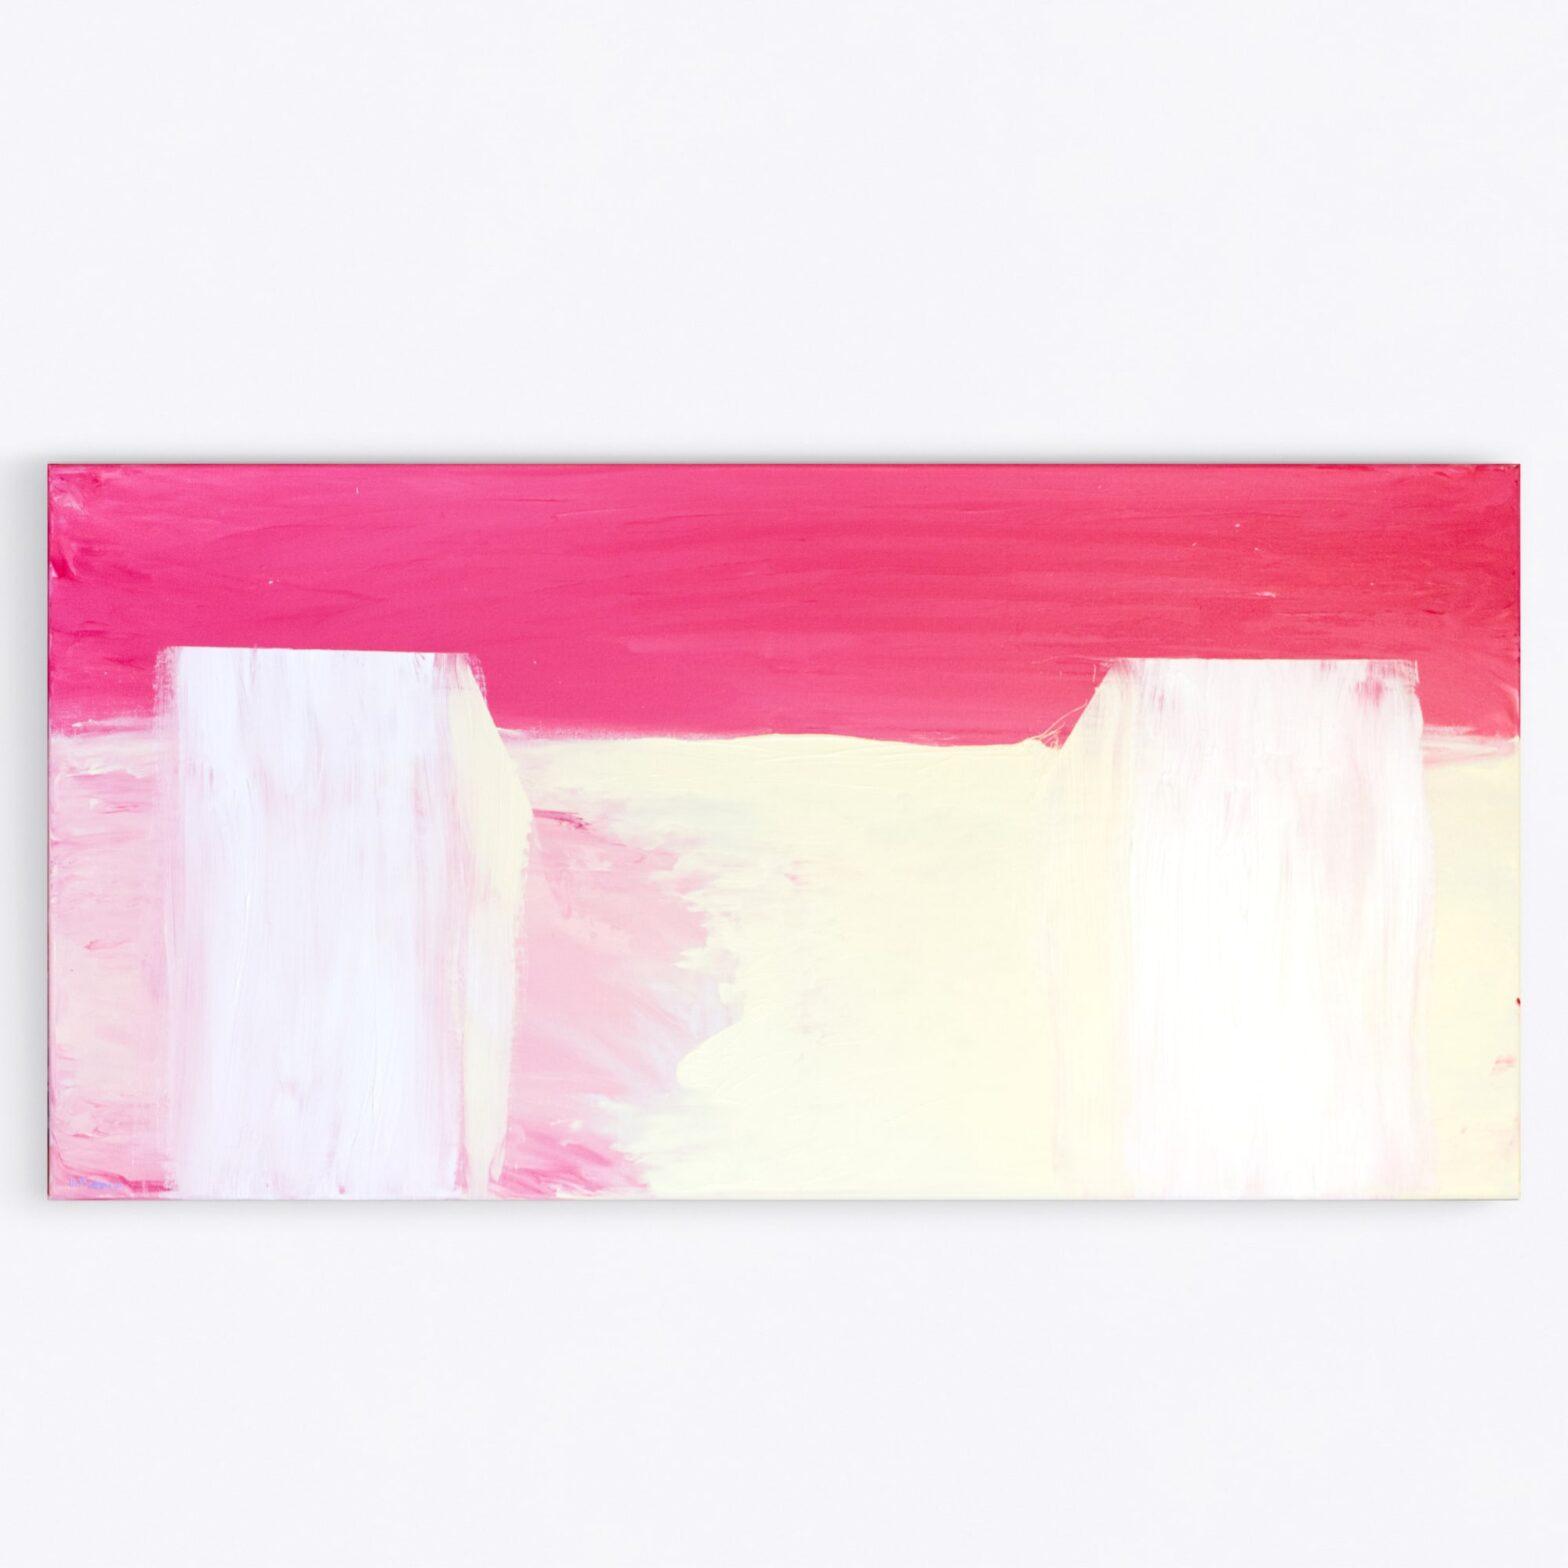 Silence, Bernard Pietraga Painting, Acrylic on Canvas, Modern art